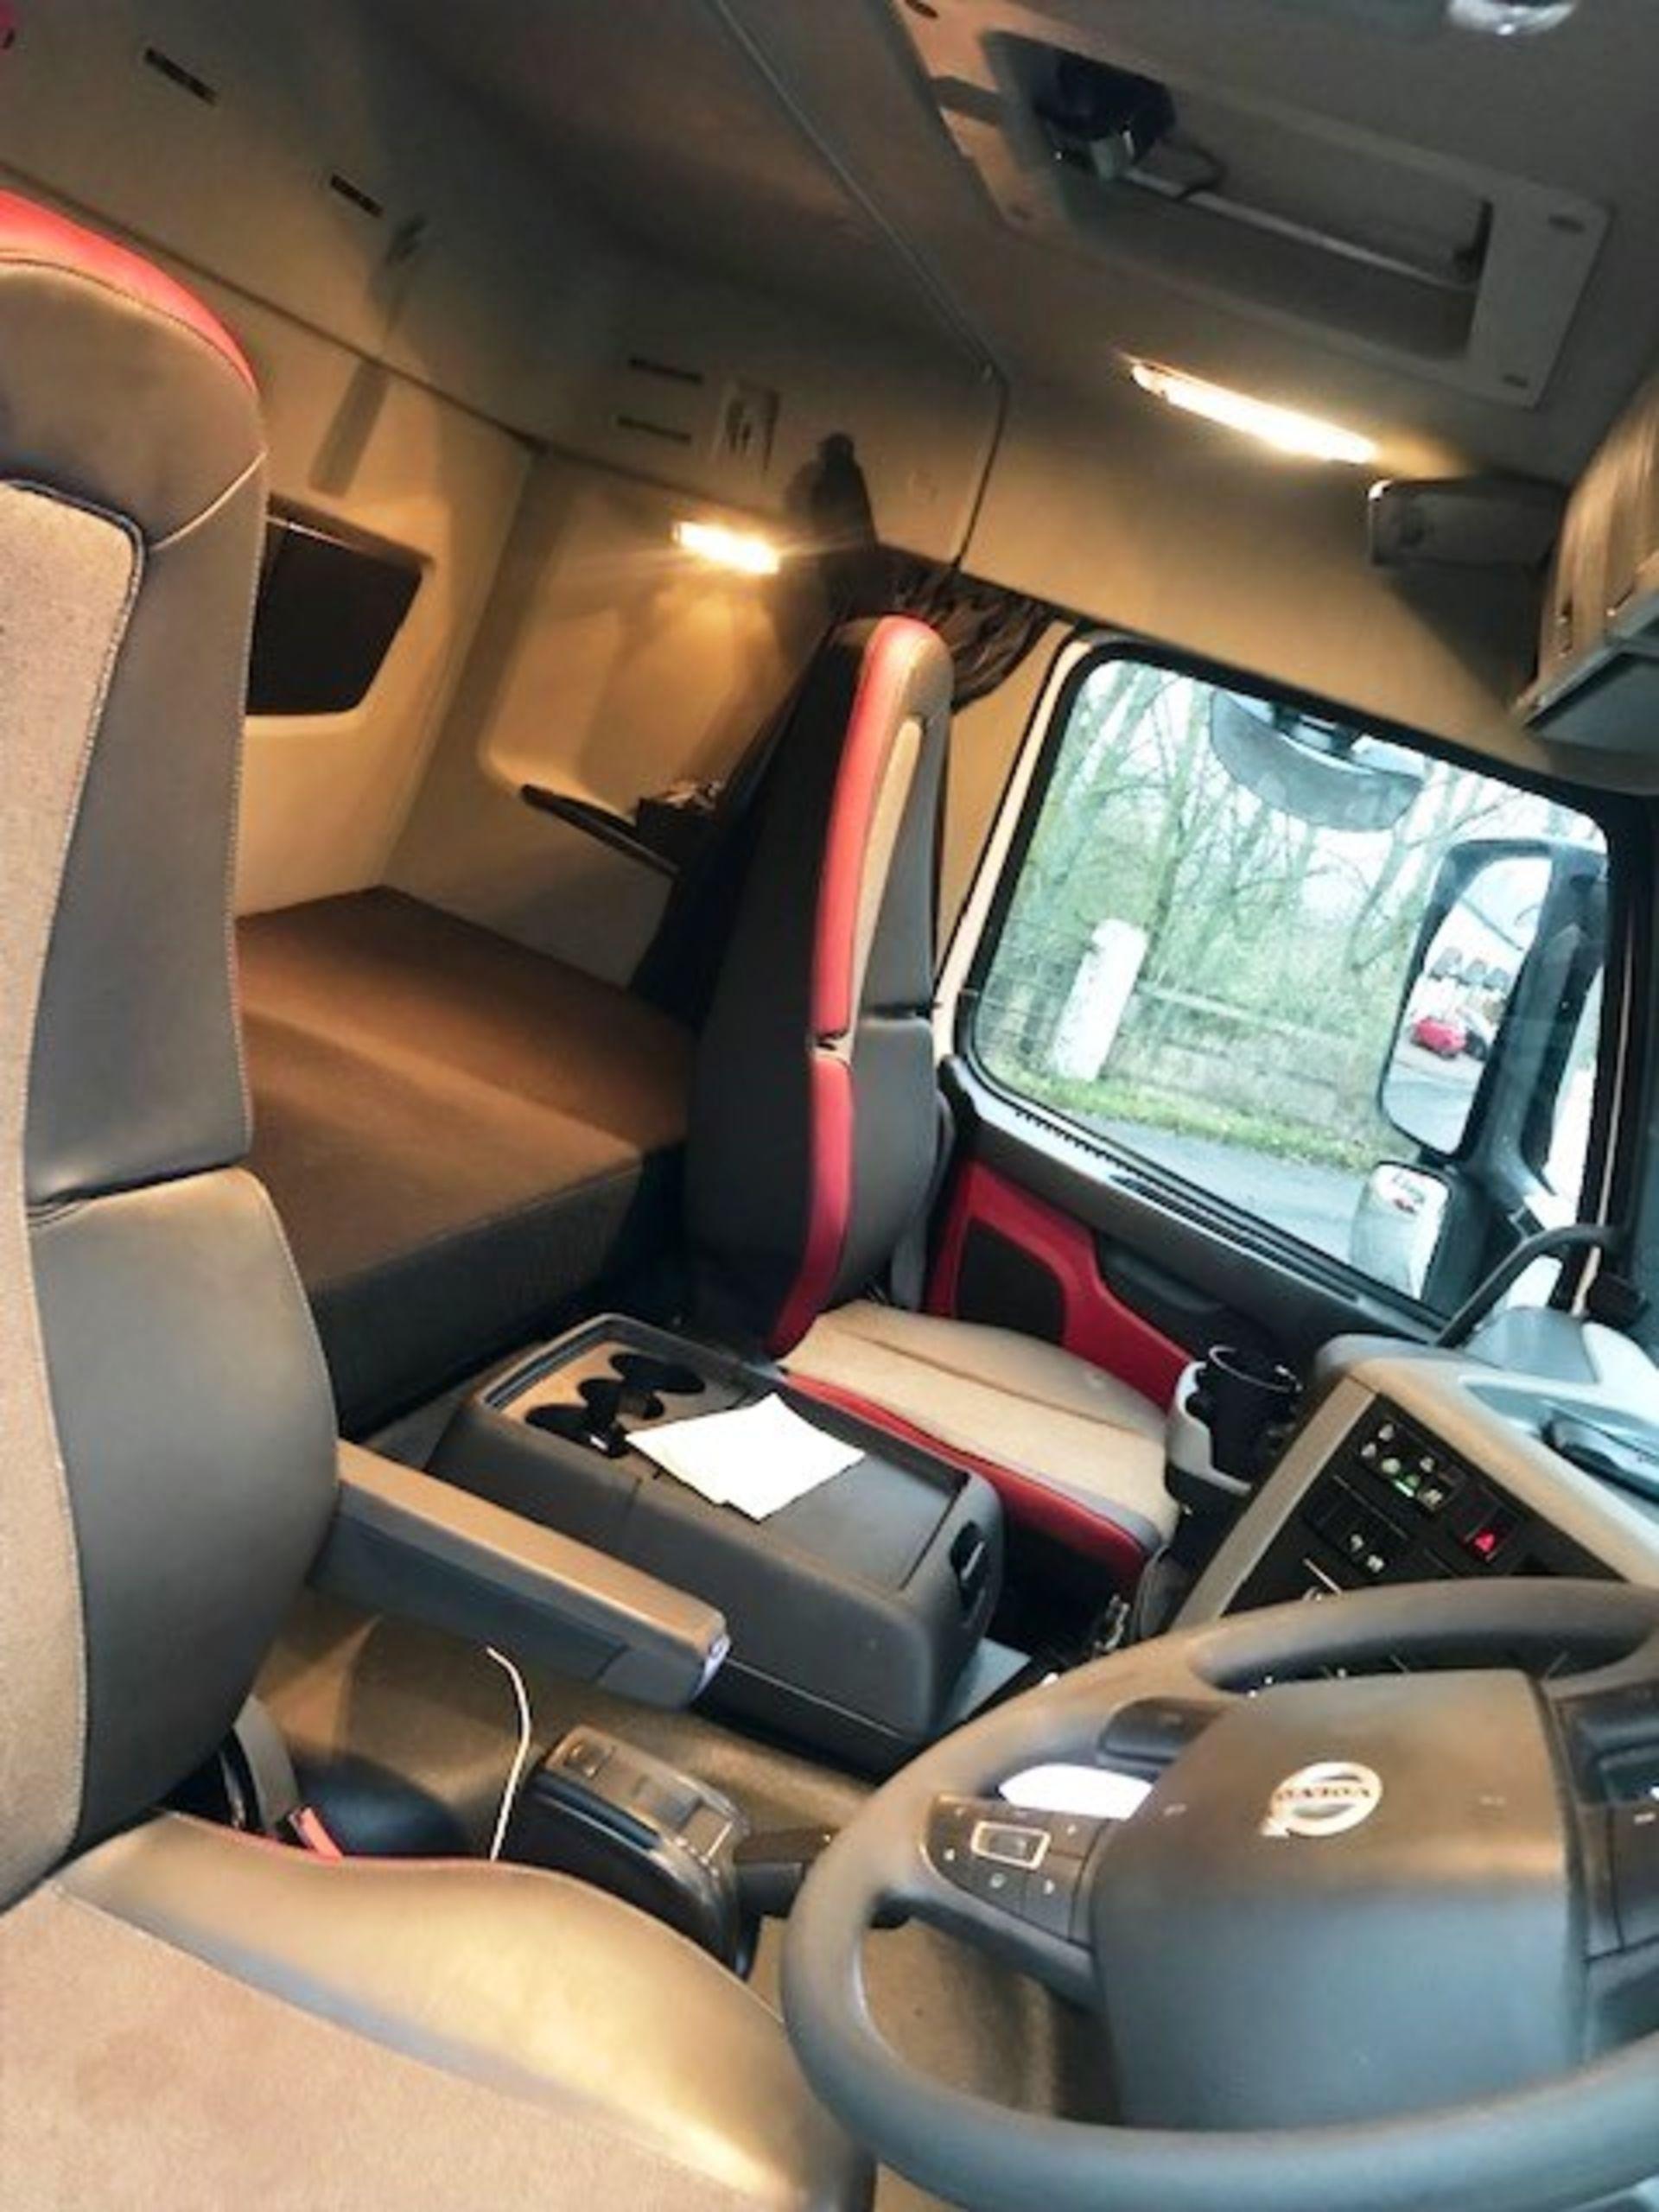 Lot 2 - 2017 | Volvo FM450 8x4 Sleeper Cab w/ Aliweld 5ft 10 Insulated Tipping Body | 170,000km